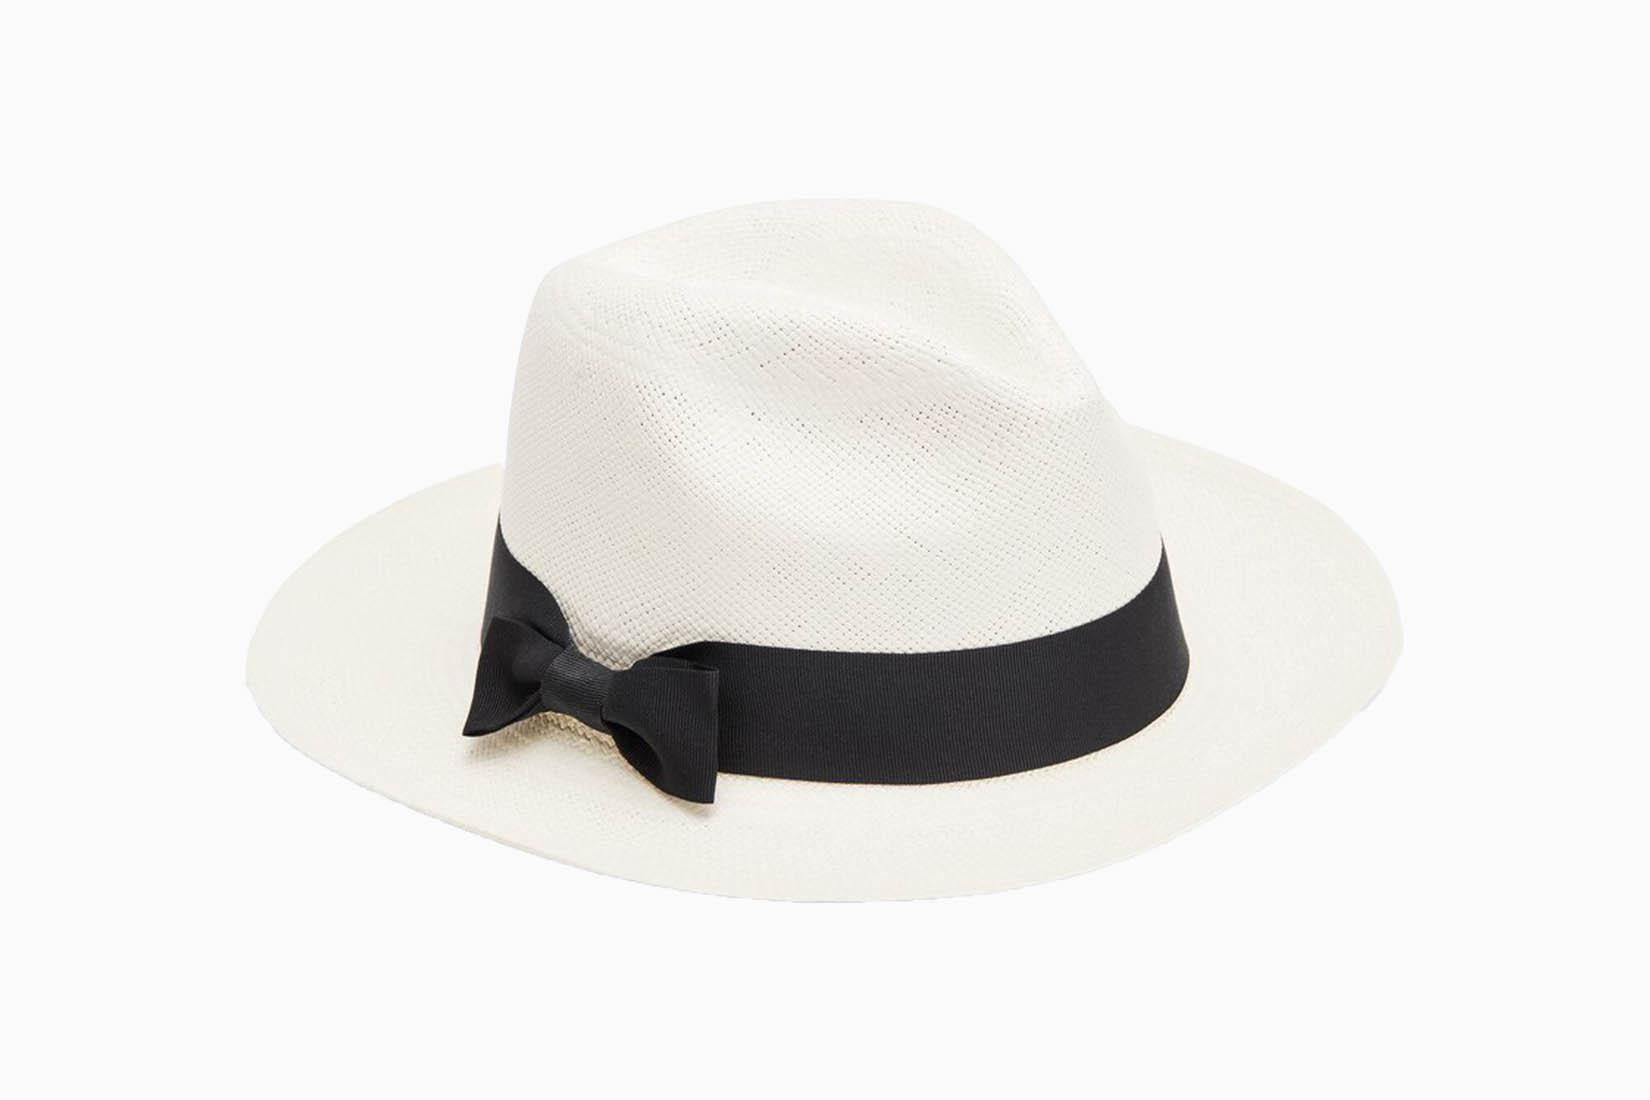 best sun hats women review Cuyana Panama Luxe Digital